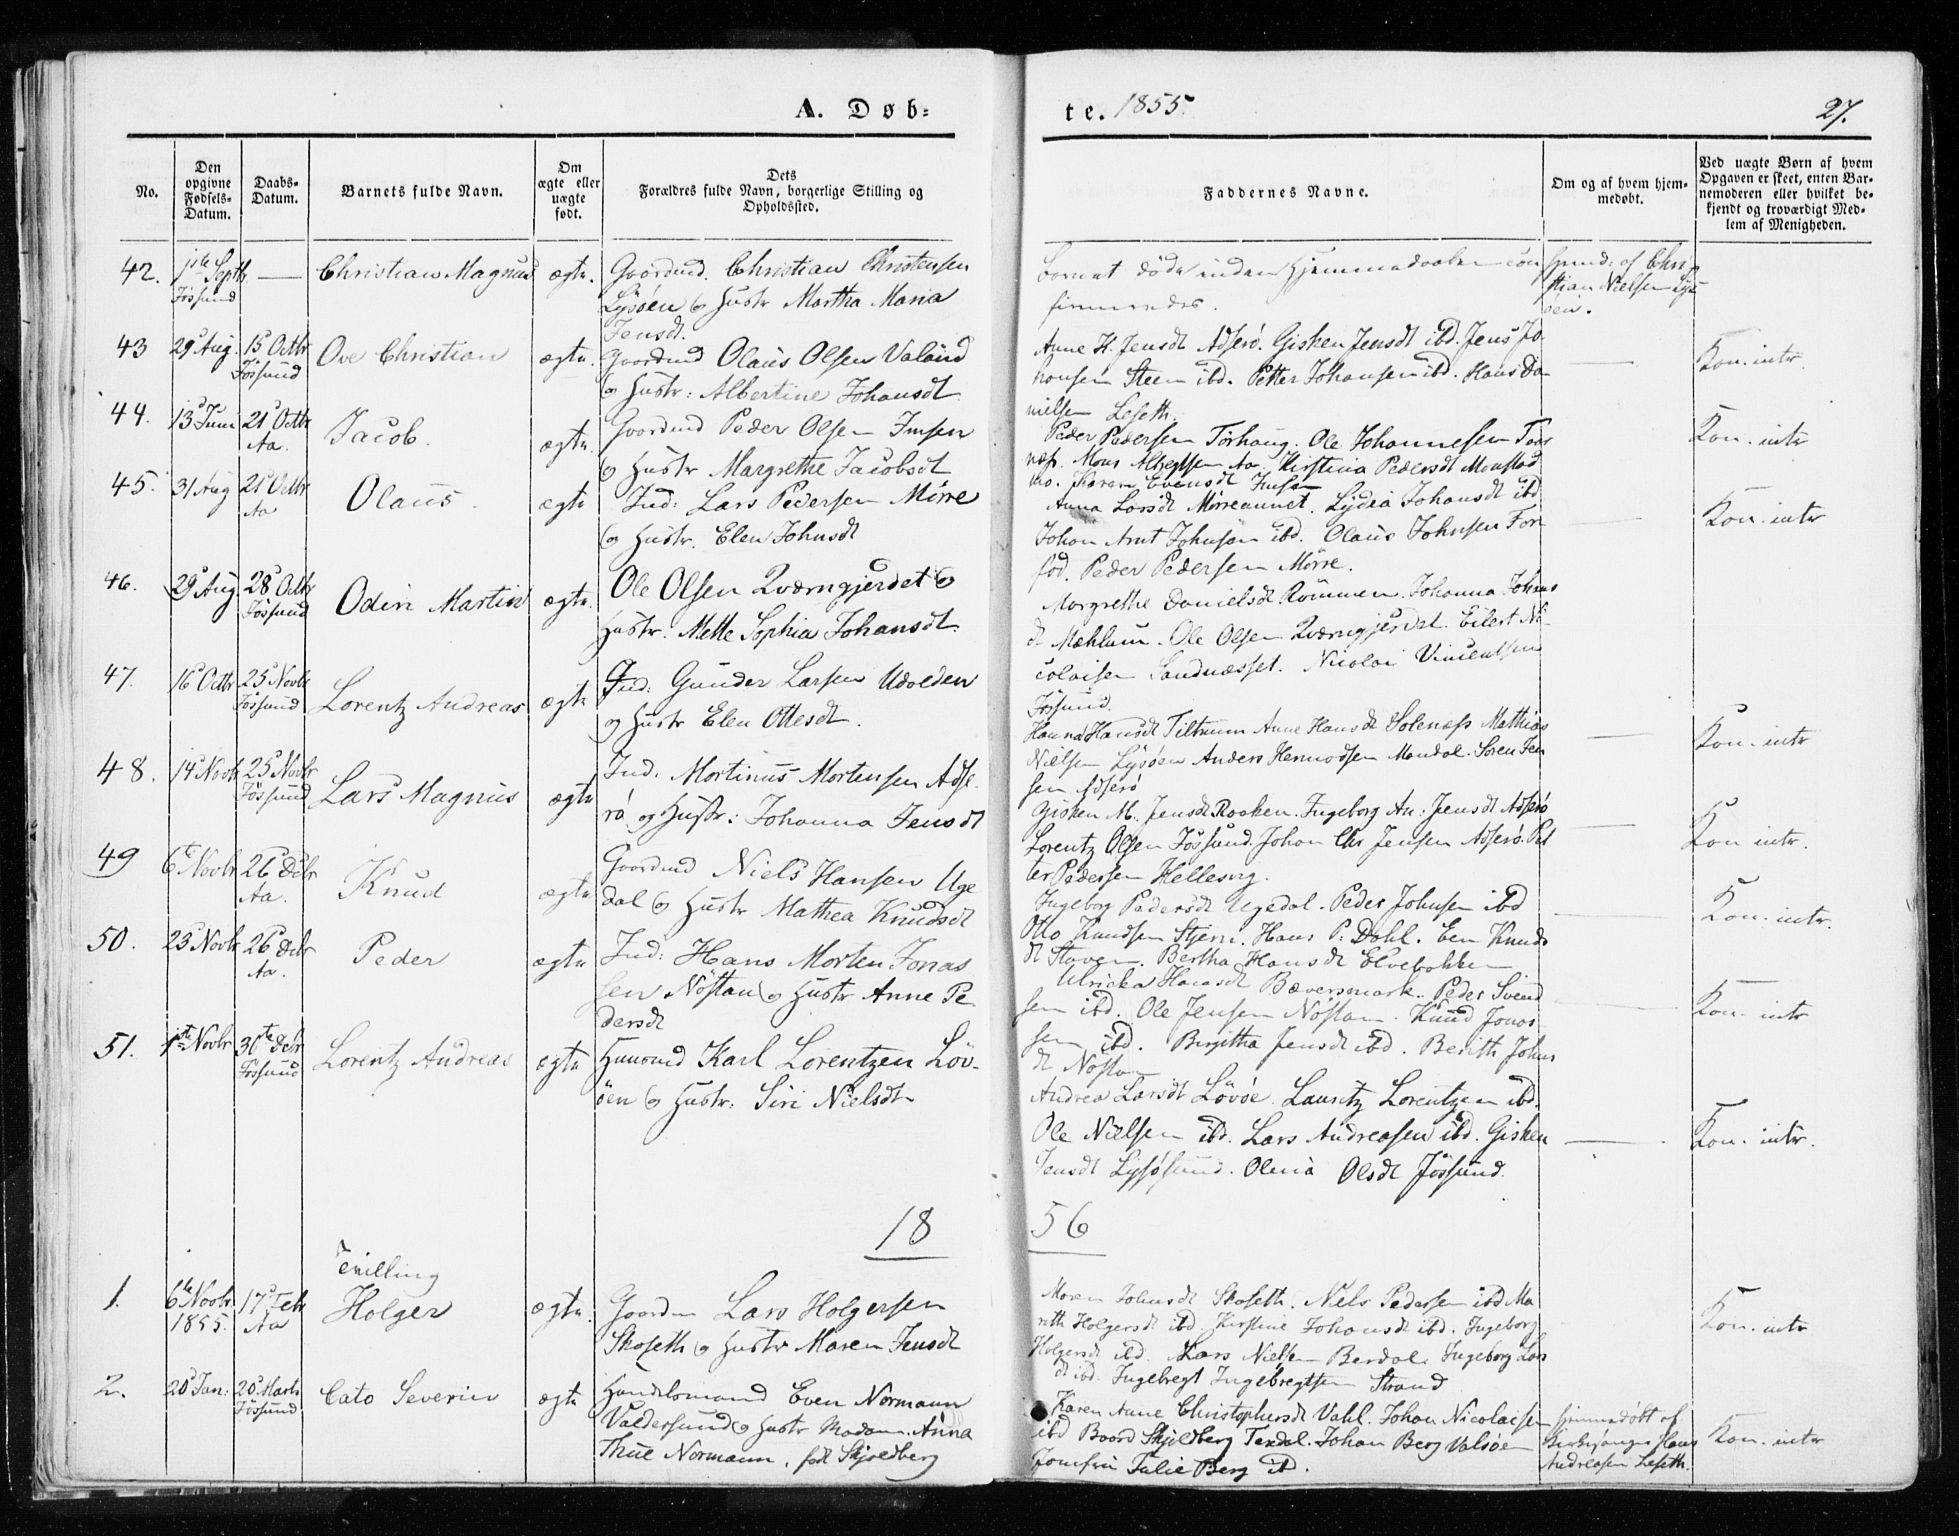 SAT, Ministerialprotokoller, klokkerbøker og fødselsregistre - Sør-Trøndelag, 655/L0677: Parish register (official) no. 655A06, 1847-1860, p. 27